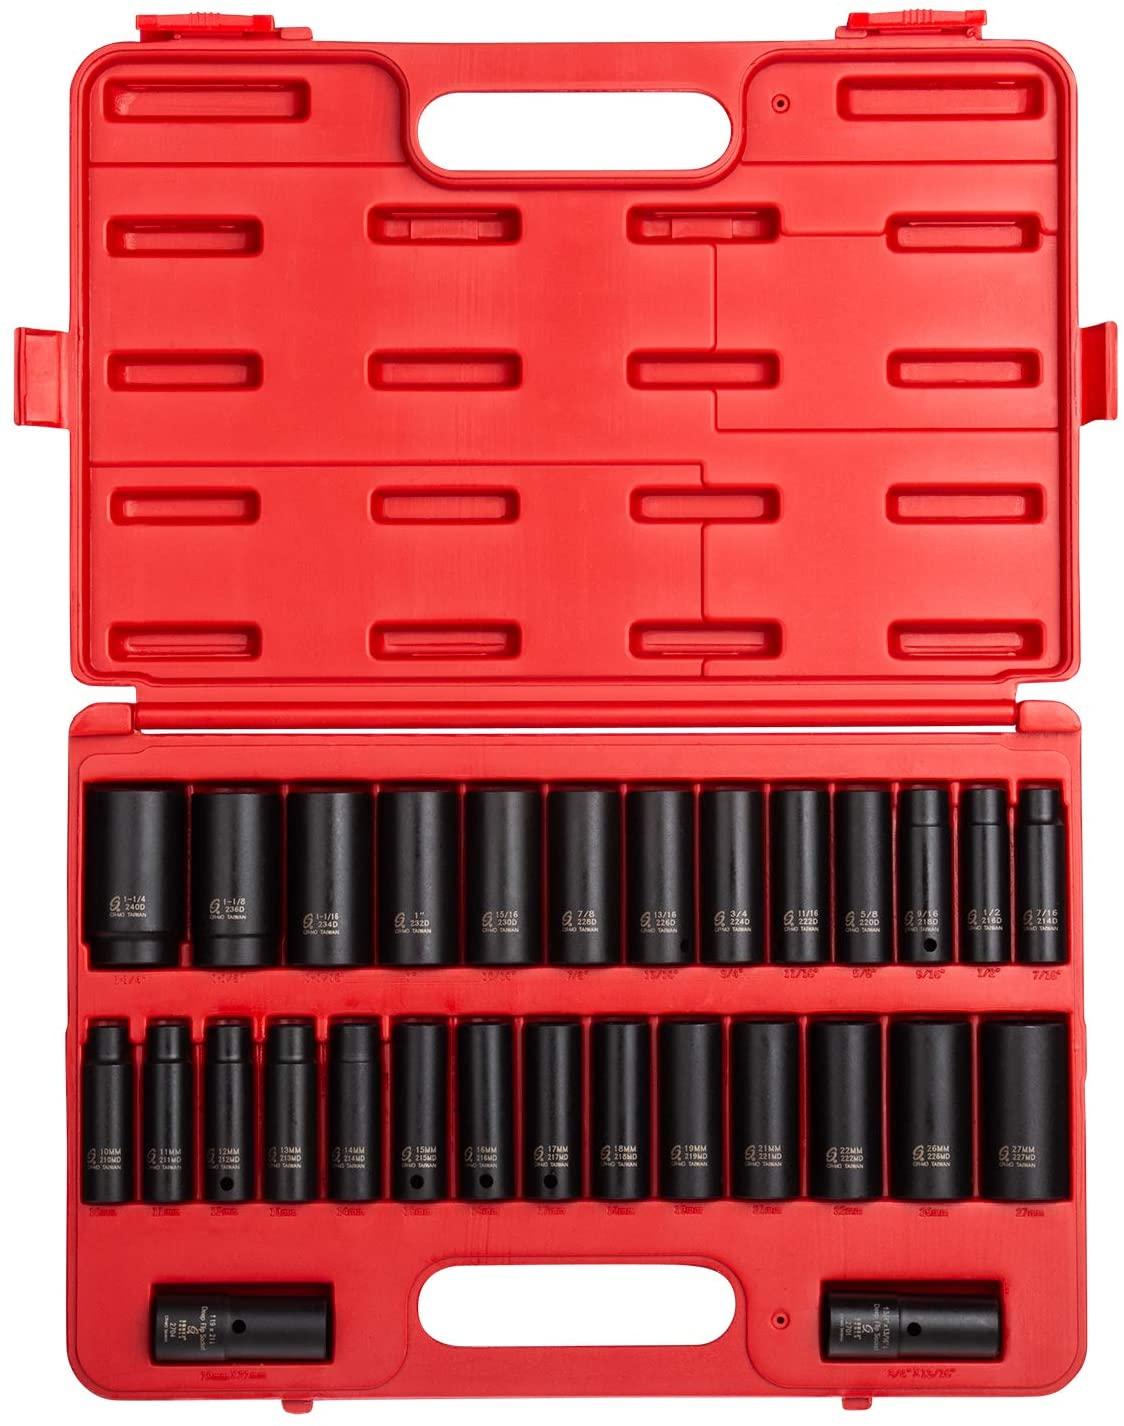 Sunex 5153DD, 1/2 Inch Drive Master Impact Socket Set, Double Deep, 29-Piece, SAE/Metric, 7/16 - 1-1/4, 10mm-27mm, Cr-Mo Steel, Radius Corner Design, Dual Size Markings, Heavy Duty Storage Case